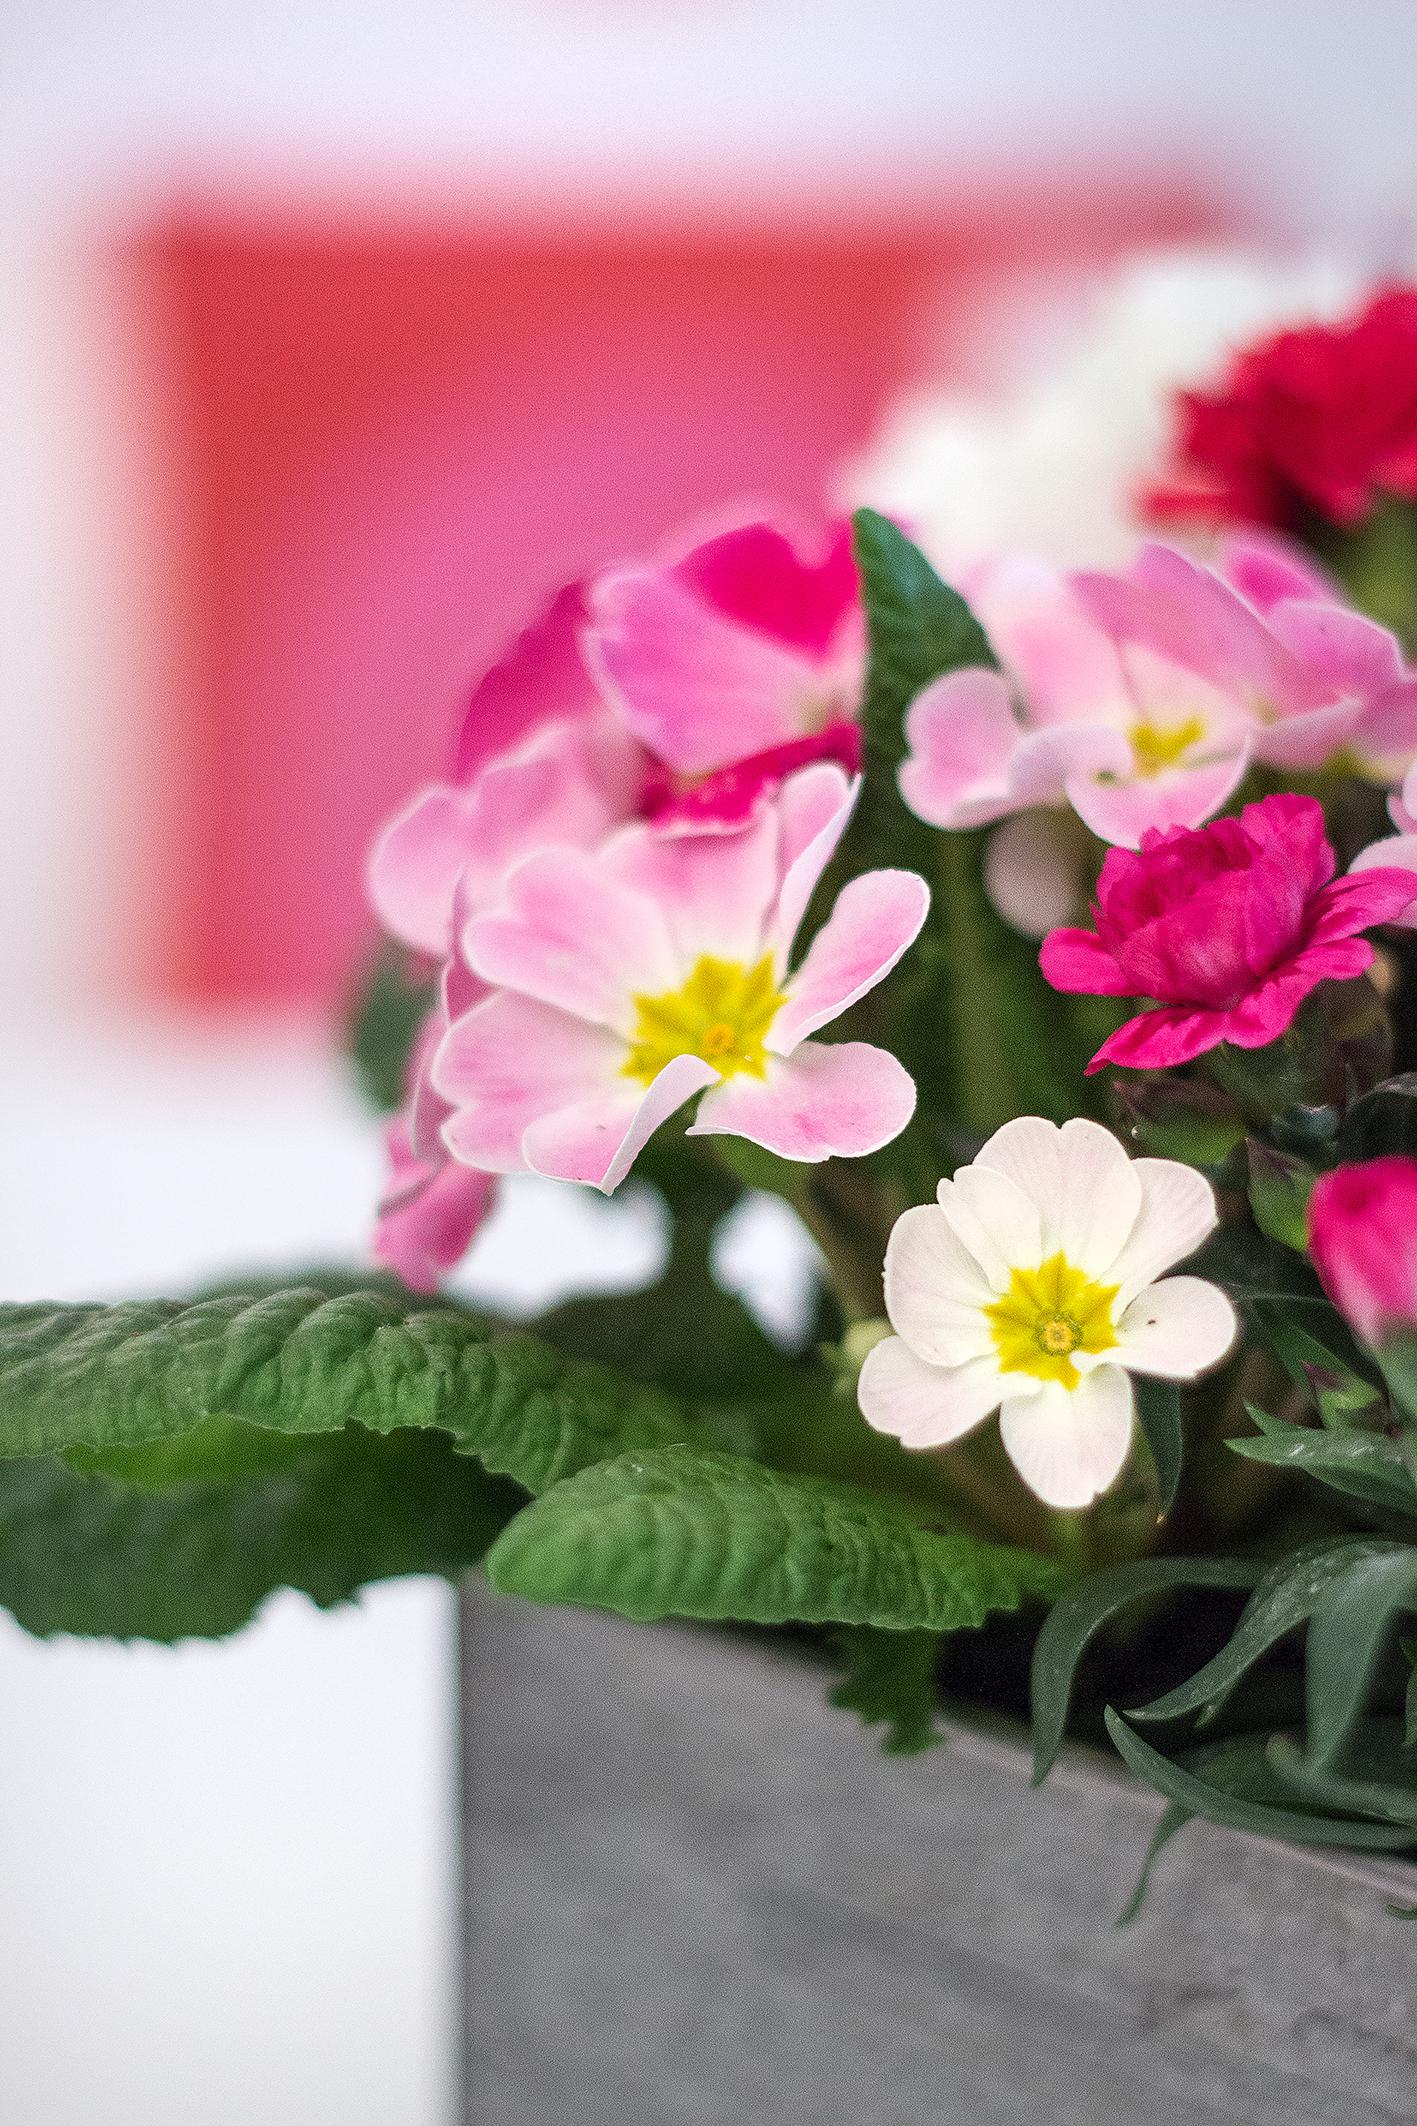 Blumen pflanzen Anleitung